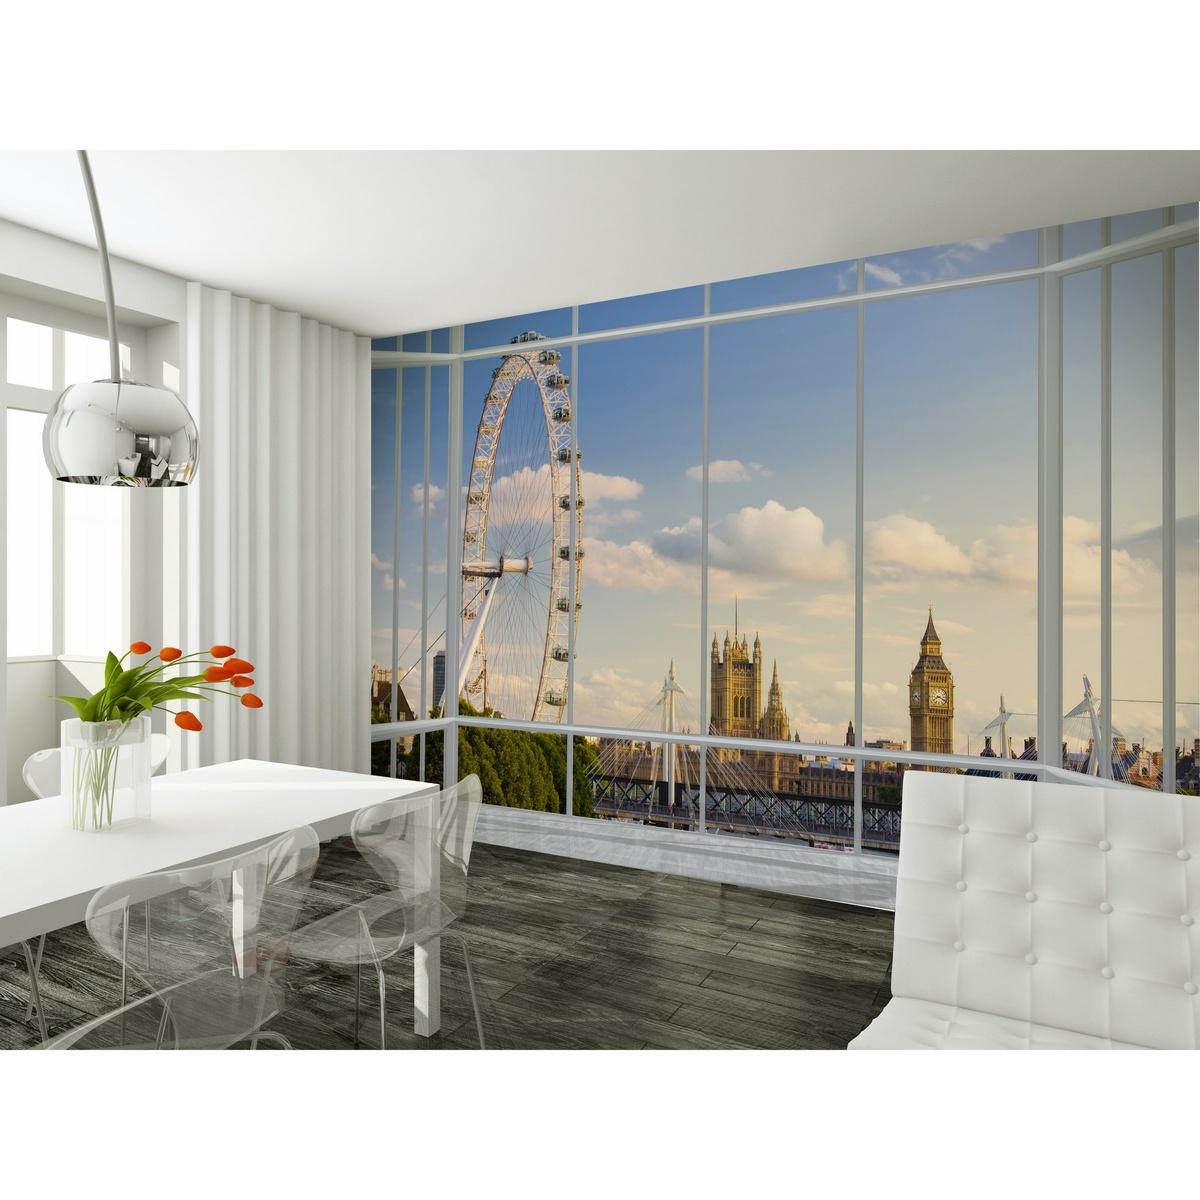 Fototapeta London 315 x 232 cm, Wall